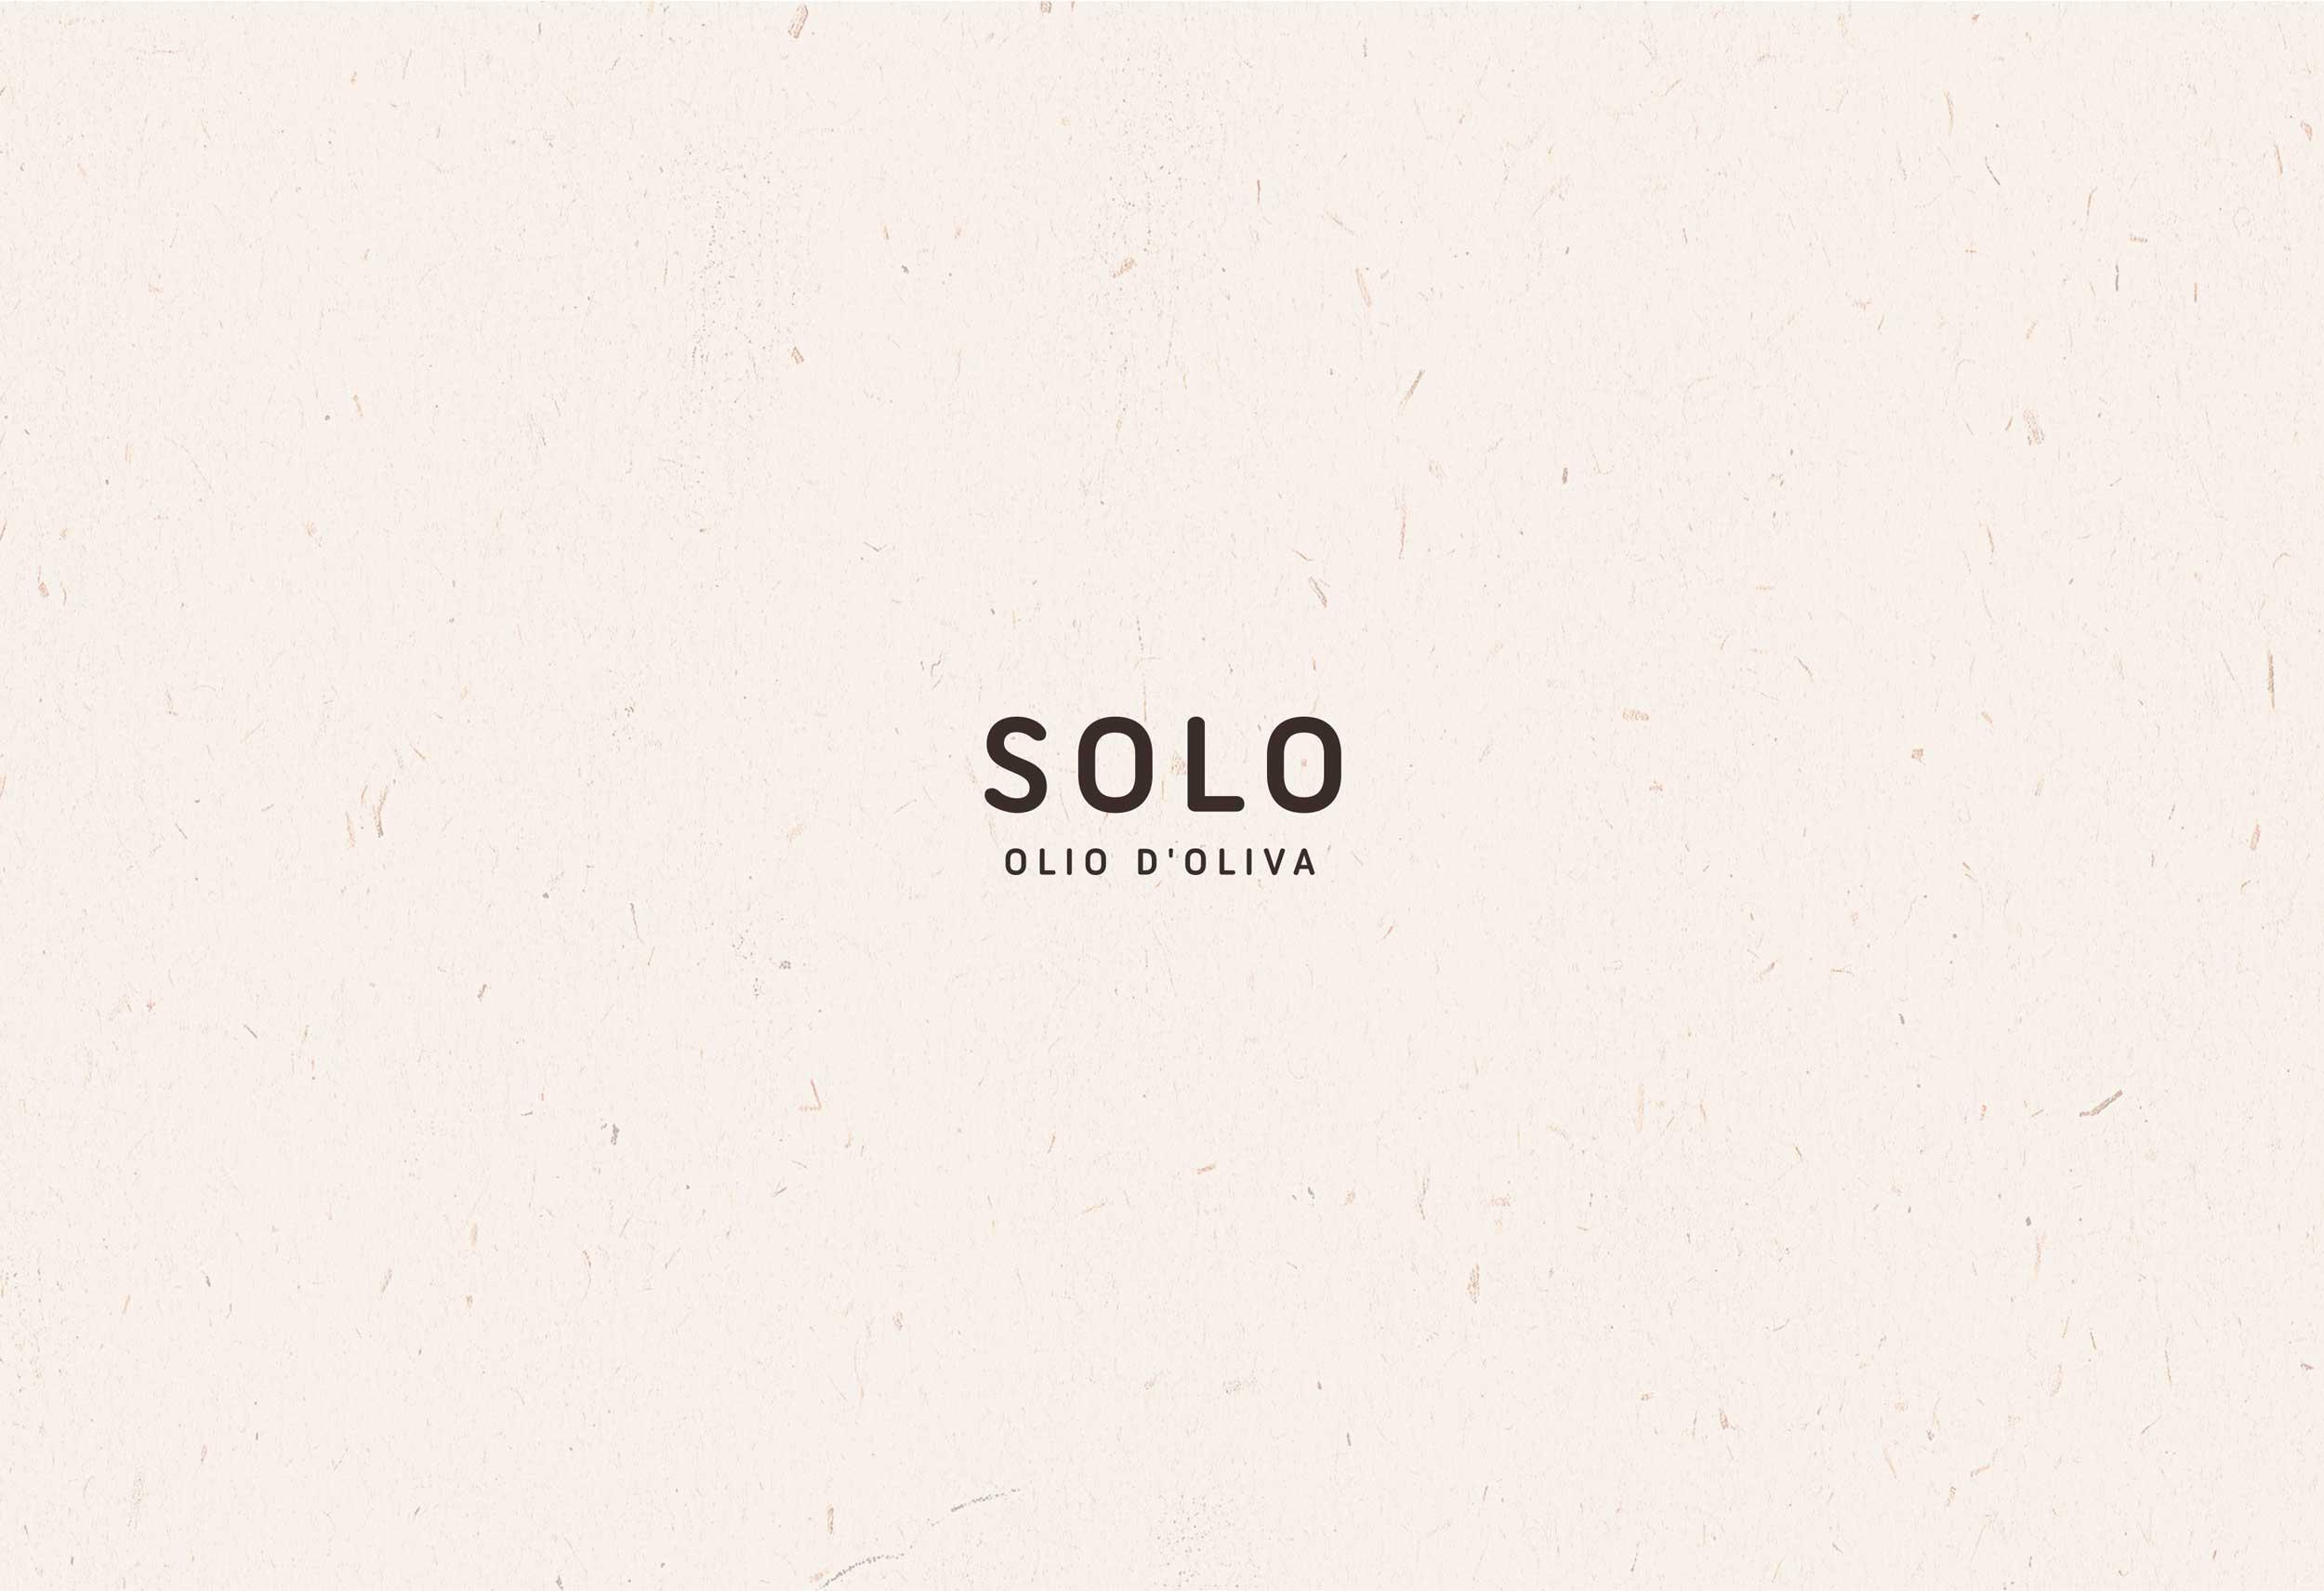 solo-olio-oliva-design-branding-packaging-label-logo-blockundstift-2